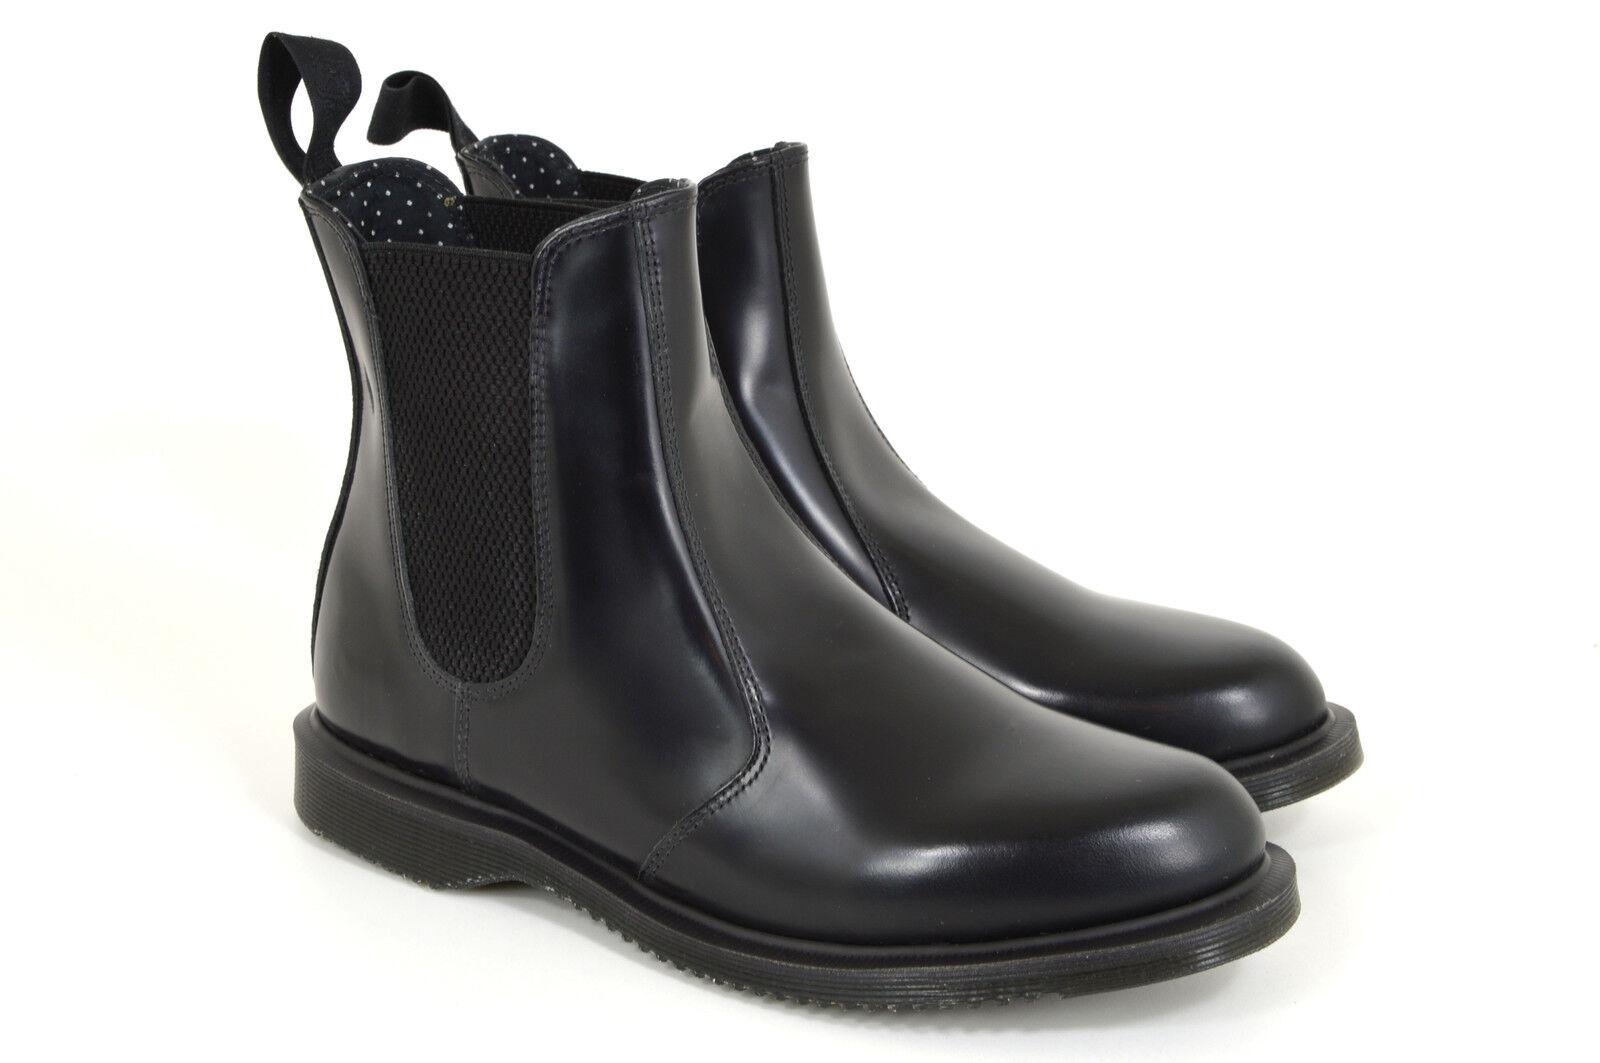 Dr. Martens flora chelsea Boots, Black, negro, chelsea Boots, cuero, nuevo